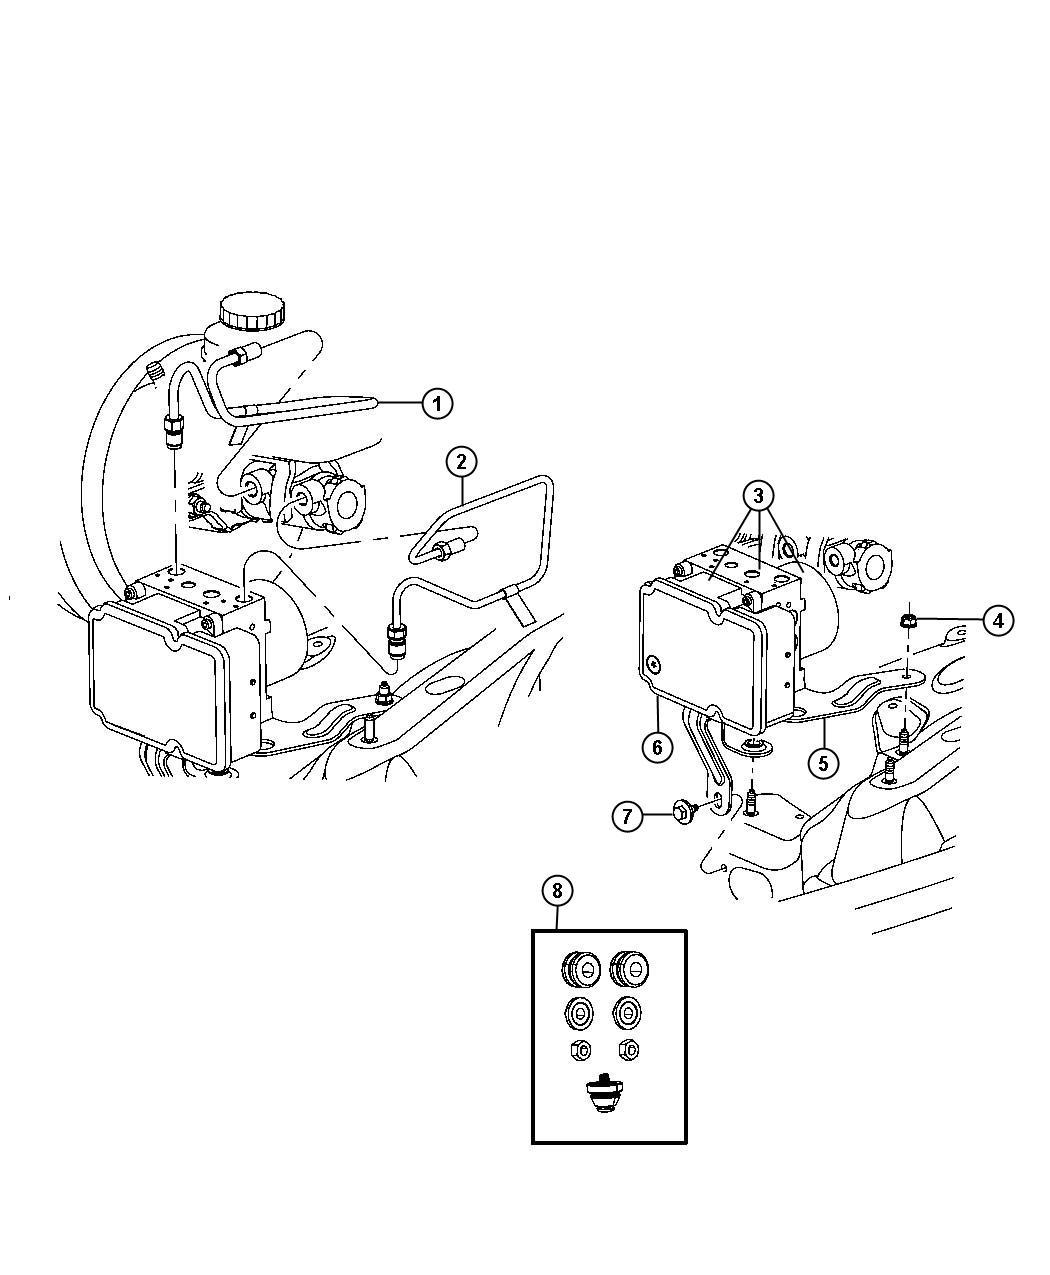 Jeep Liberty Control unit. Anti-lock brake. Stability